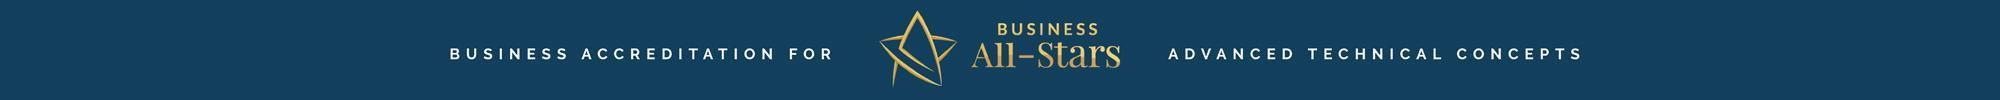 ATC awarded All-Ireland Business All-Star accreditation